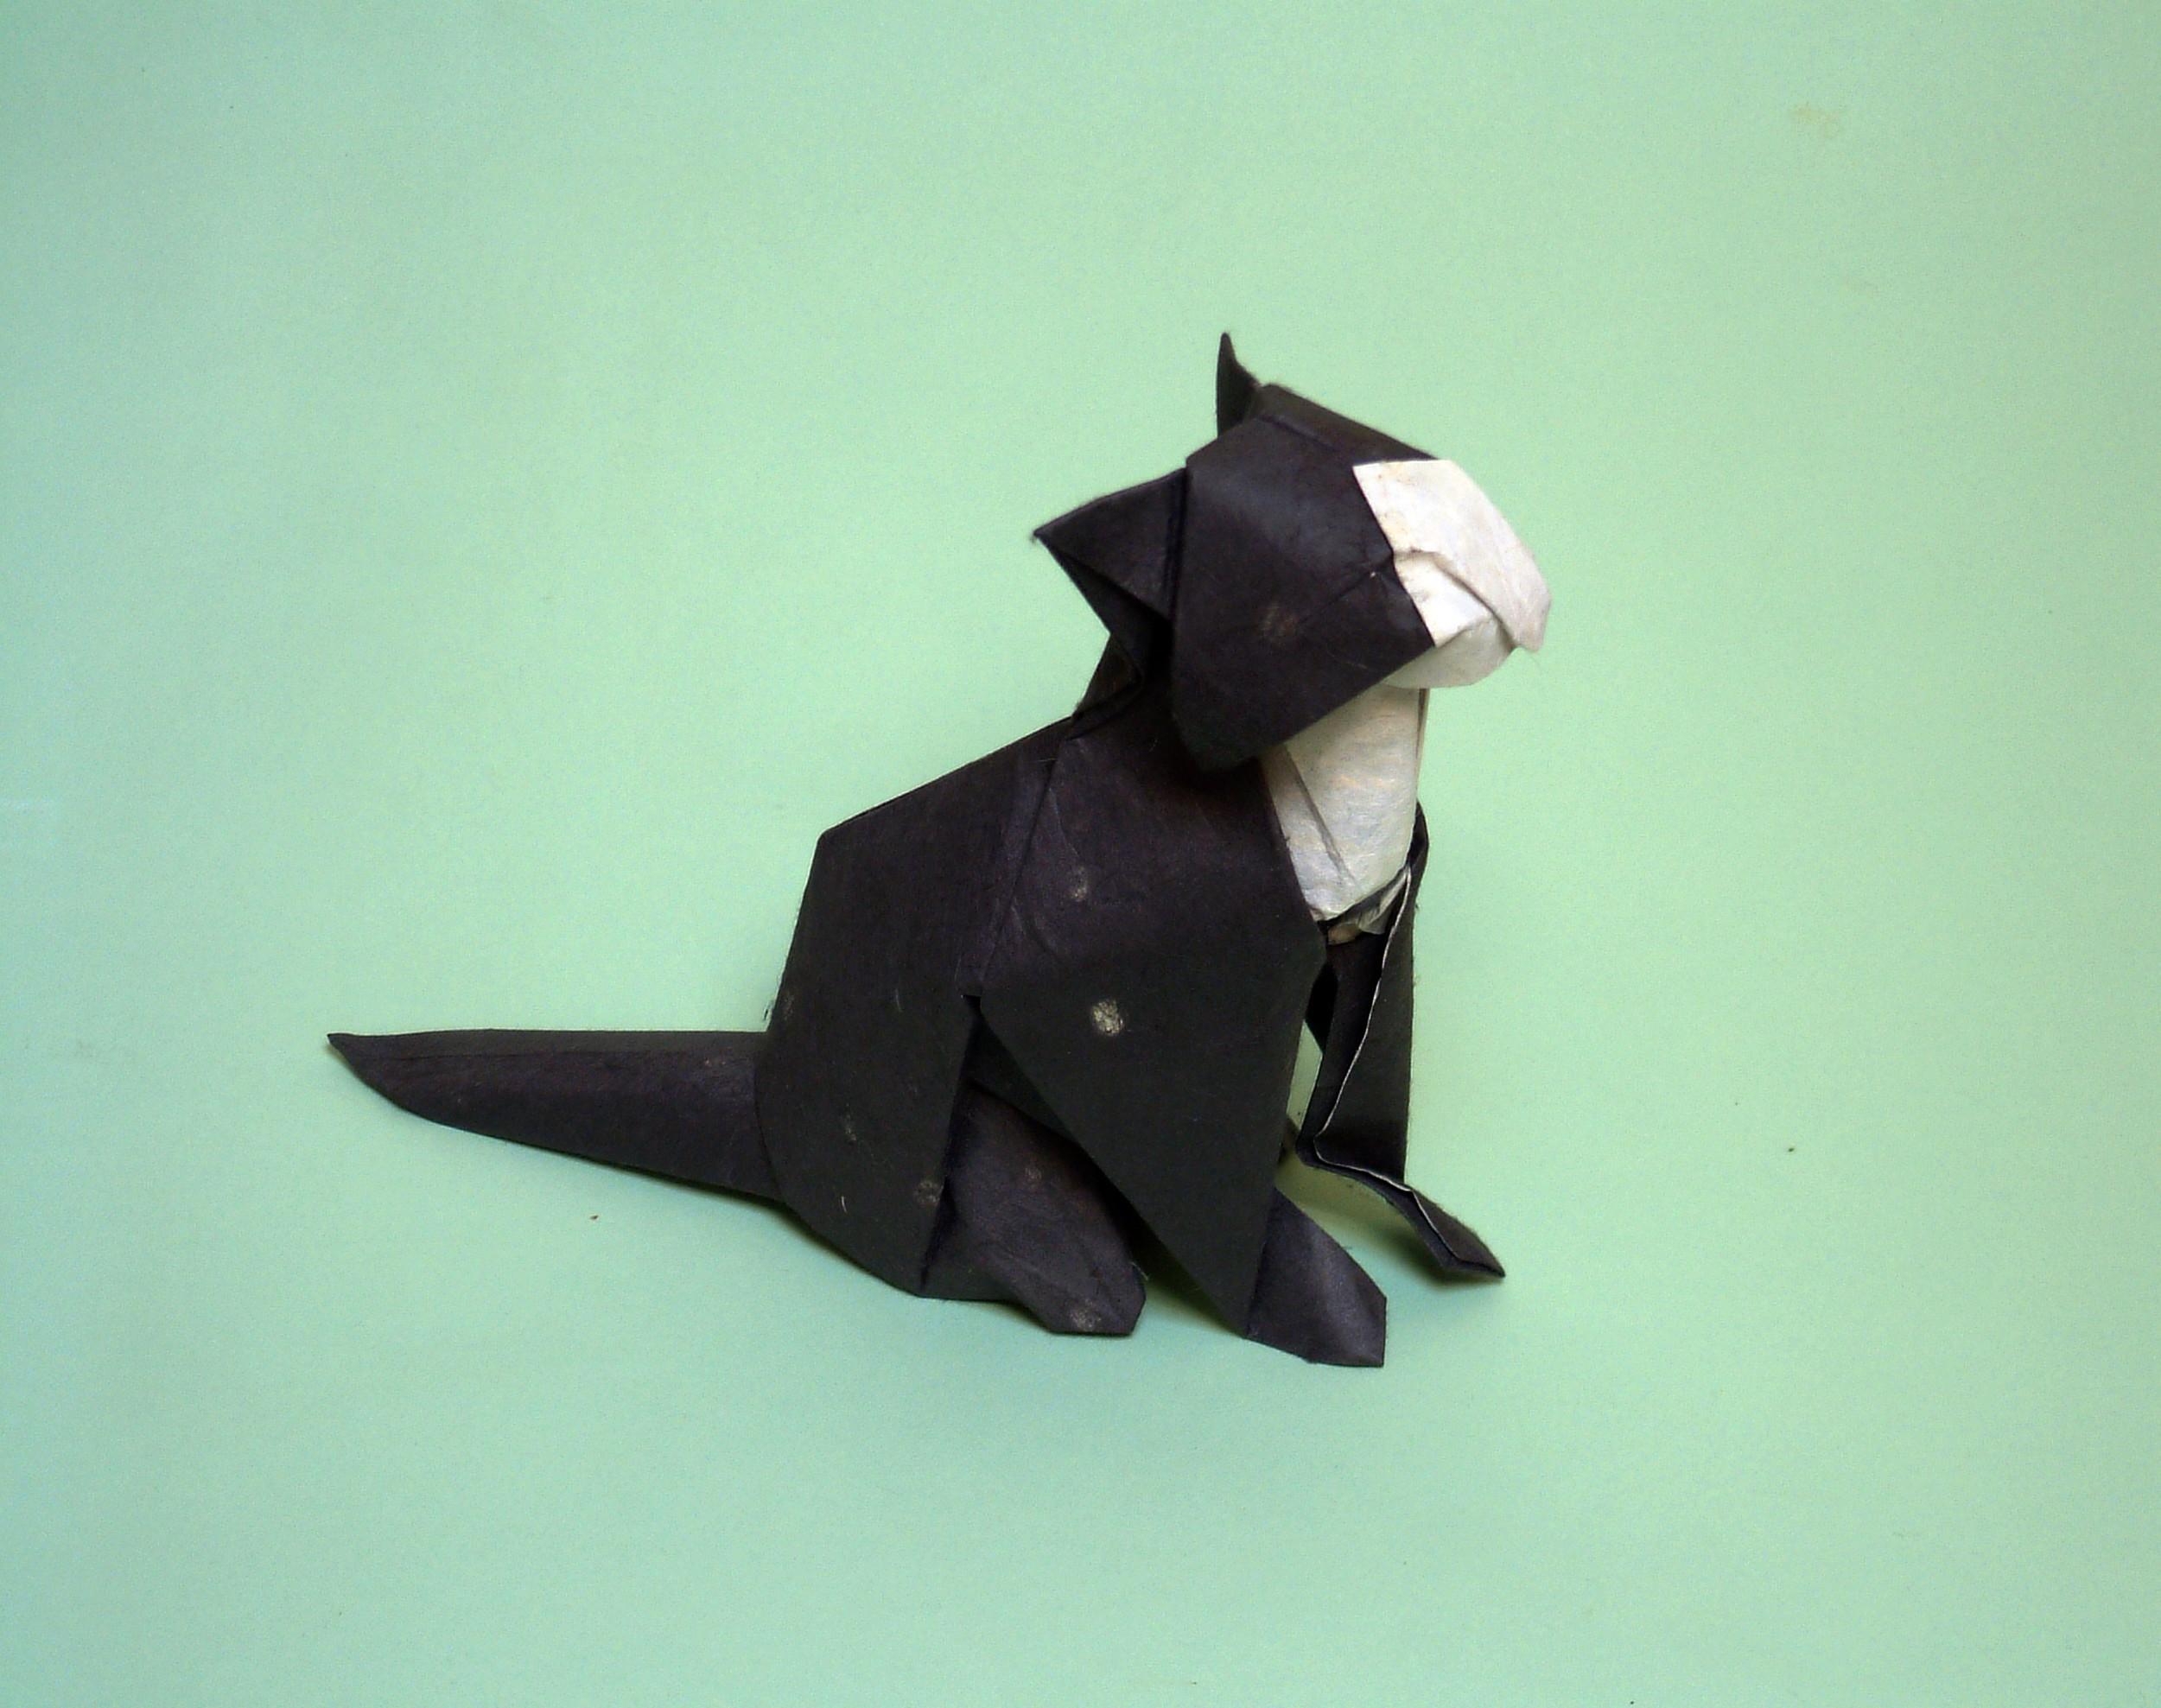 Diagrams David Brill Advanced Origami Fox Instructions Diagram Of The Squirrel